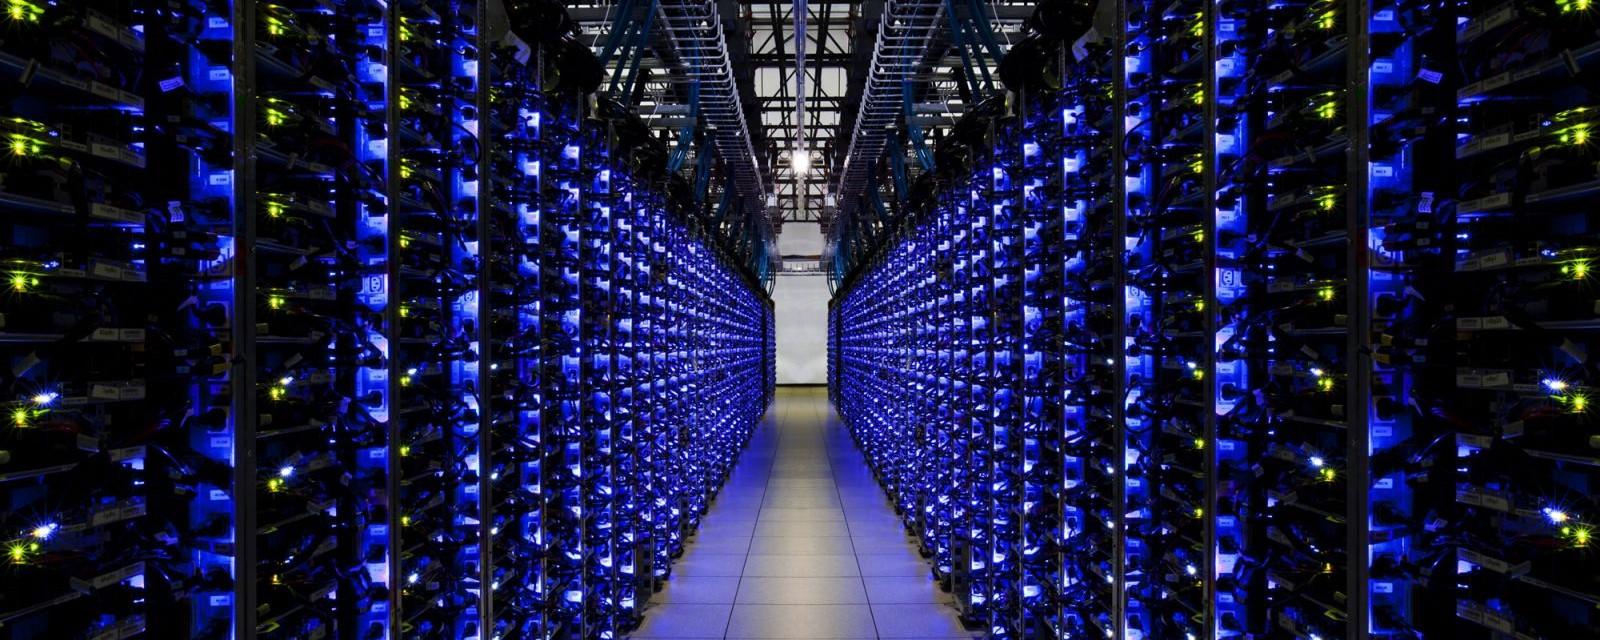 Datacenter Rack Success And Popularity Of Datacenter In Phoenix Arizona